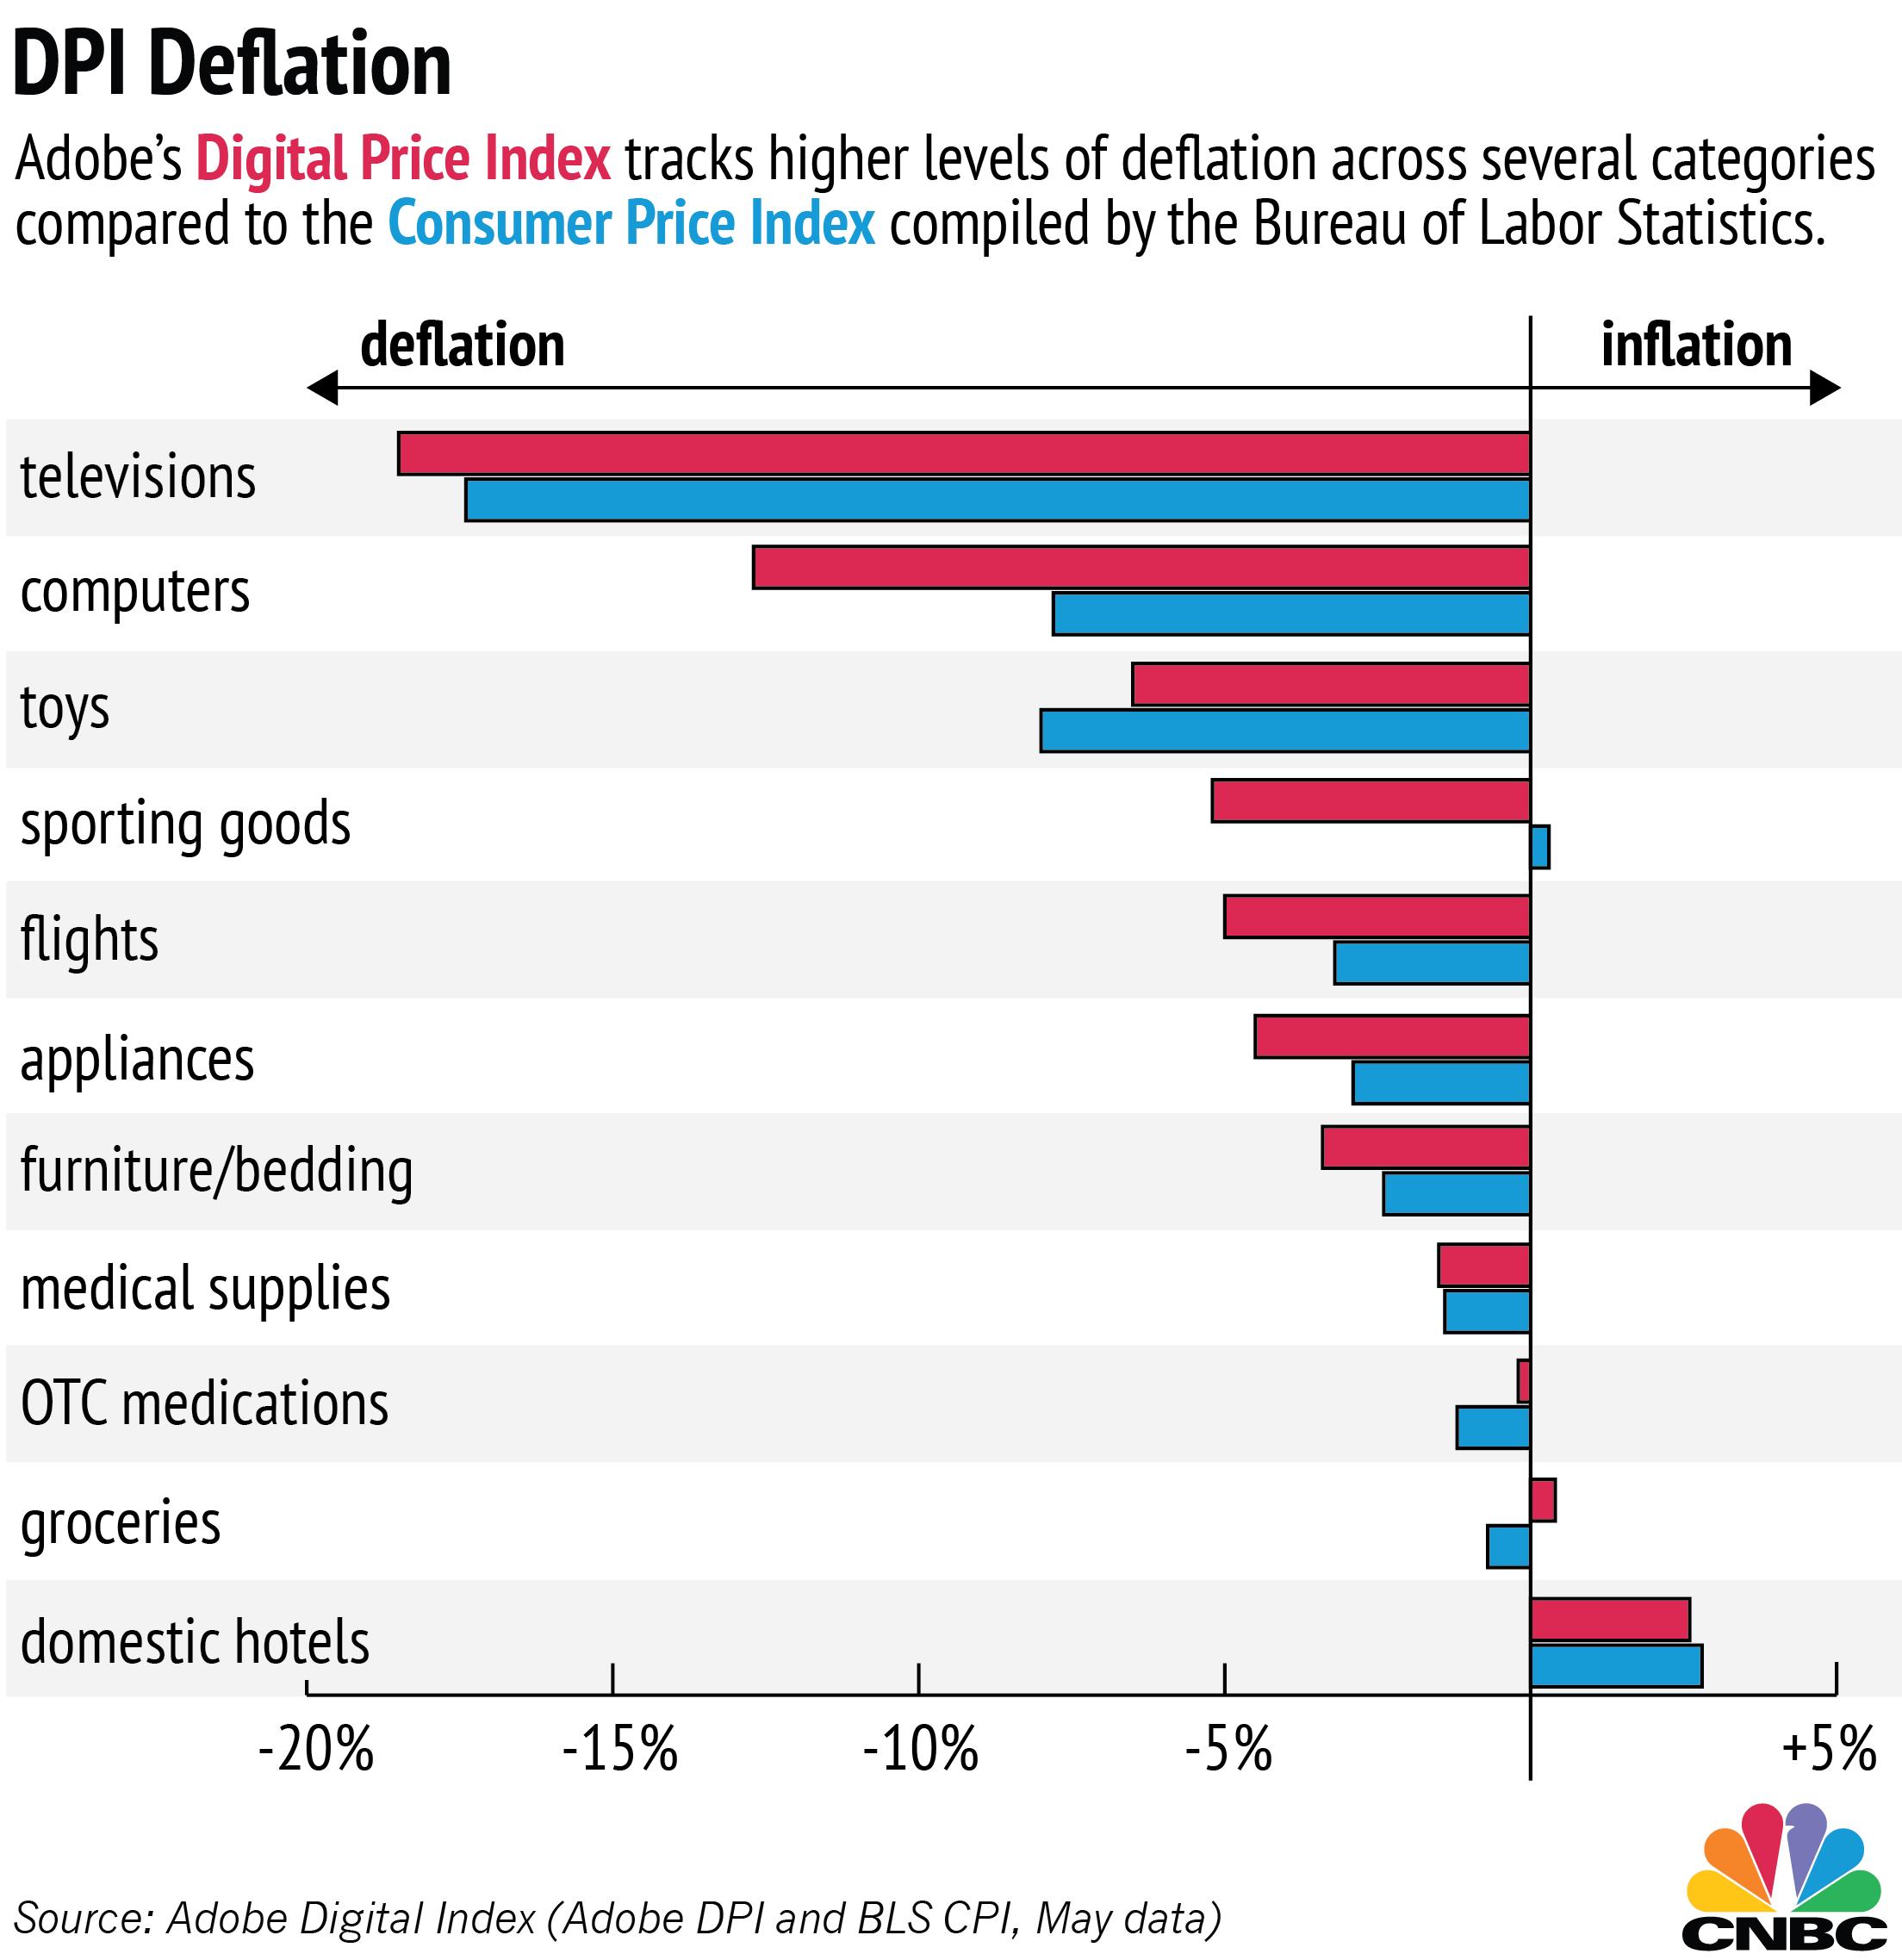 Madison : Deflation